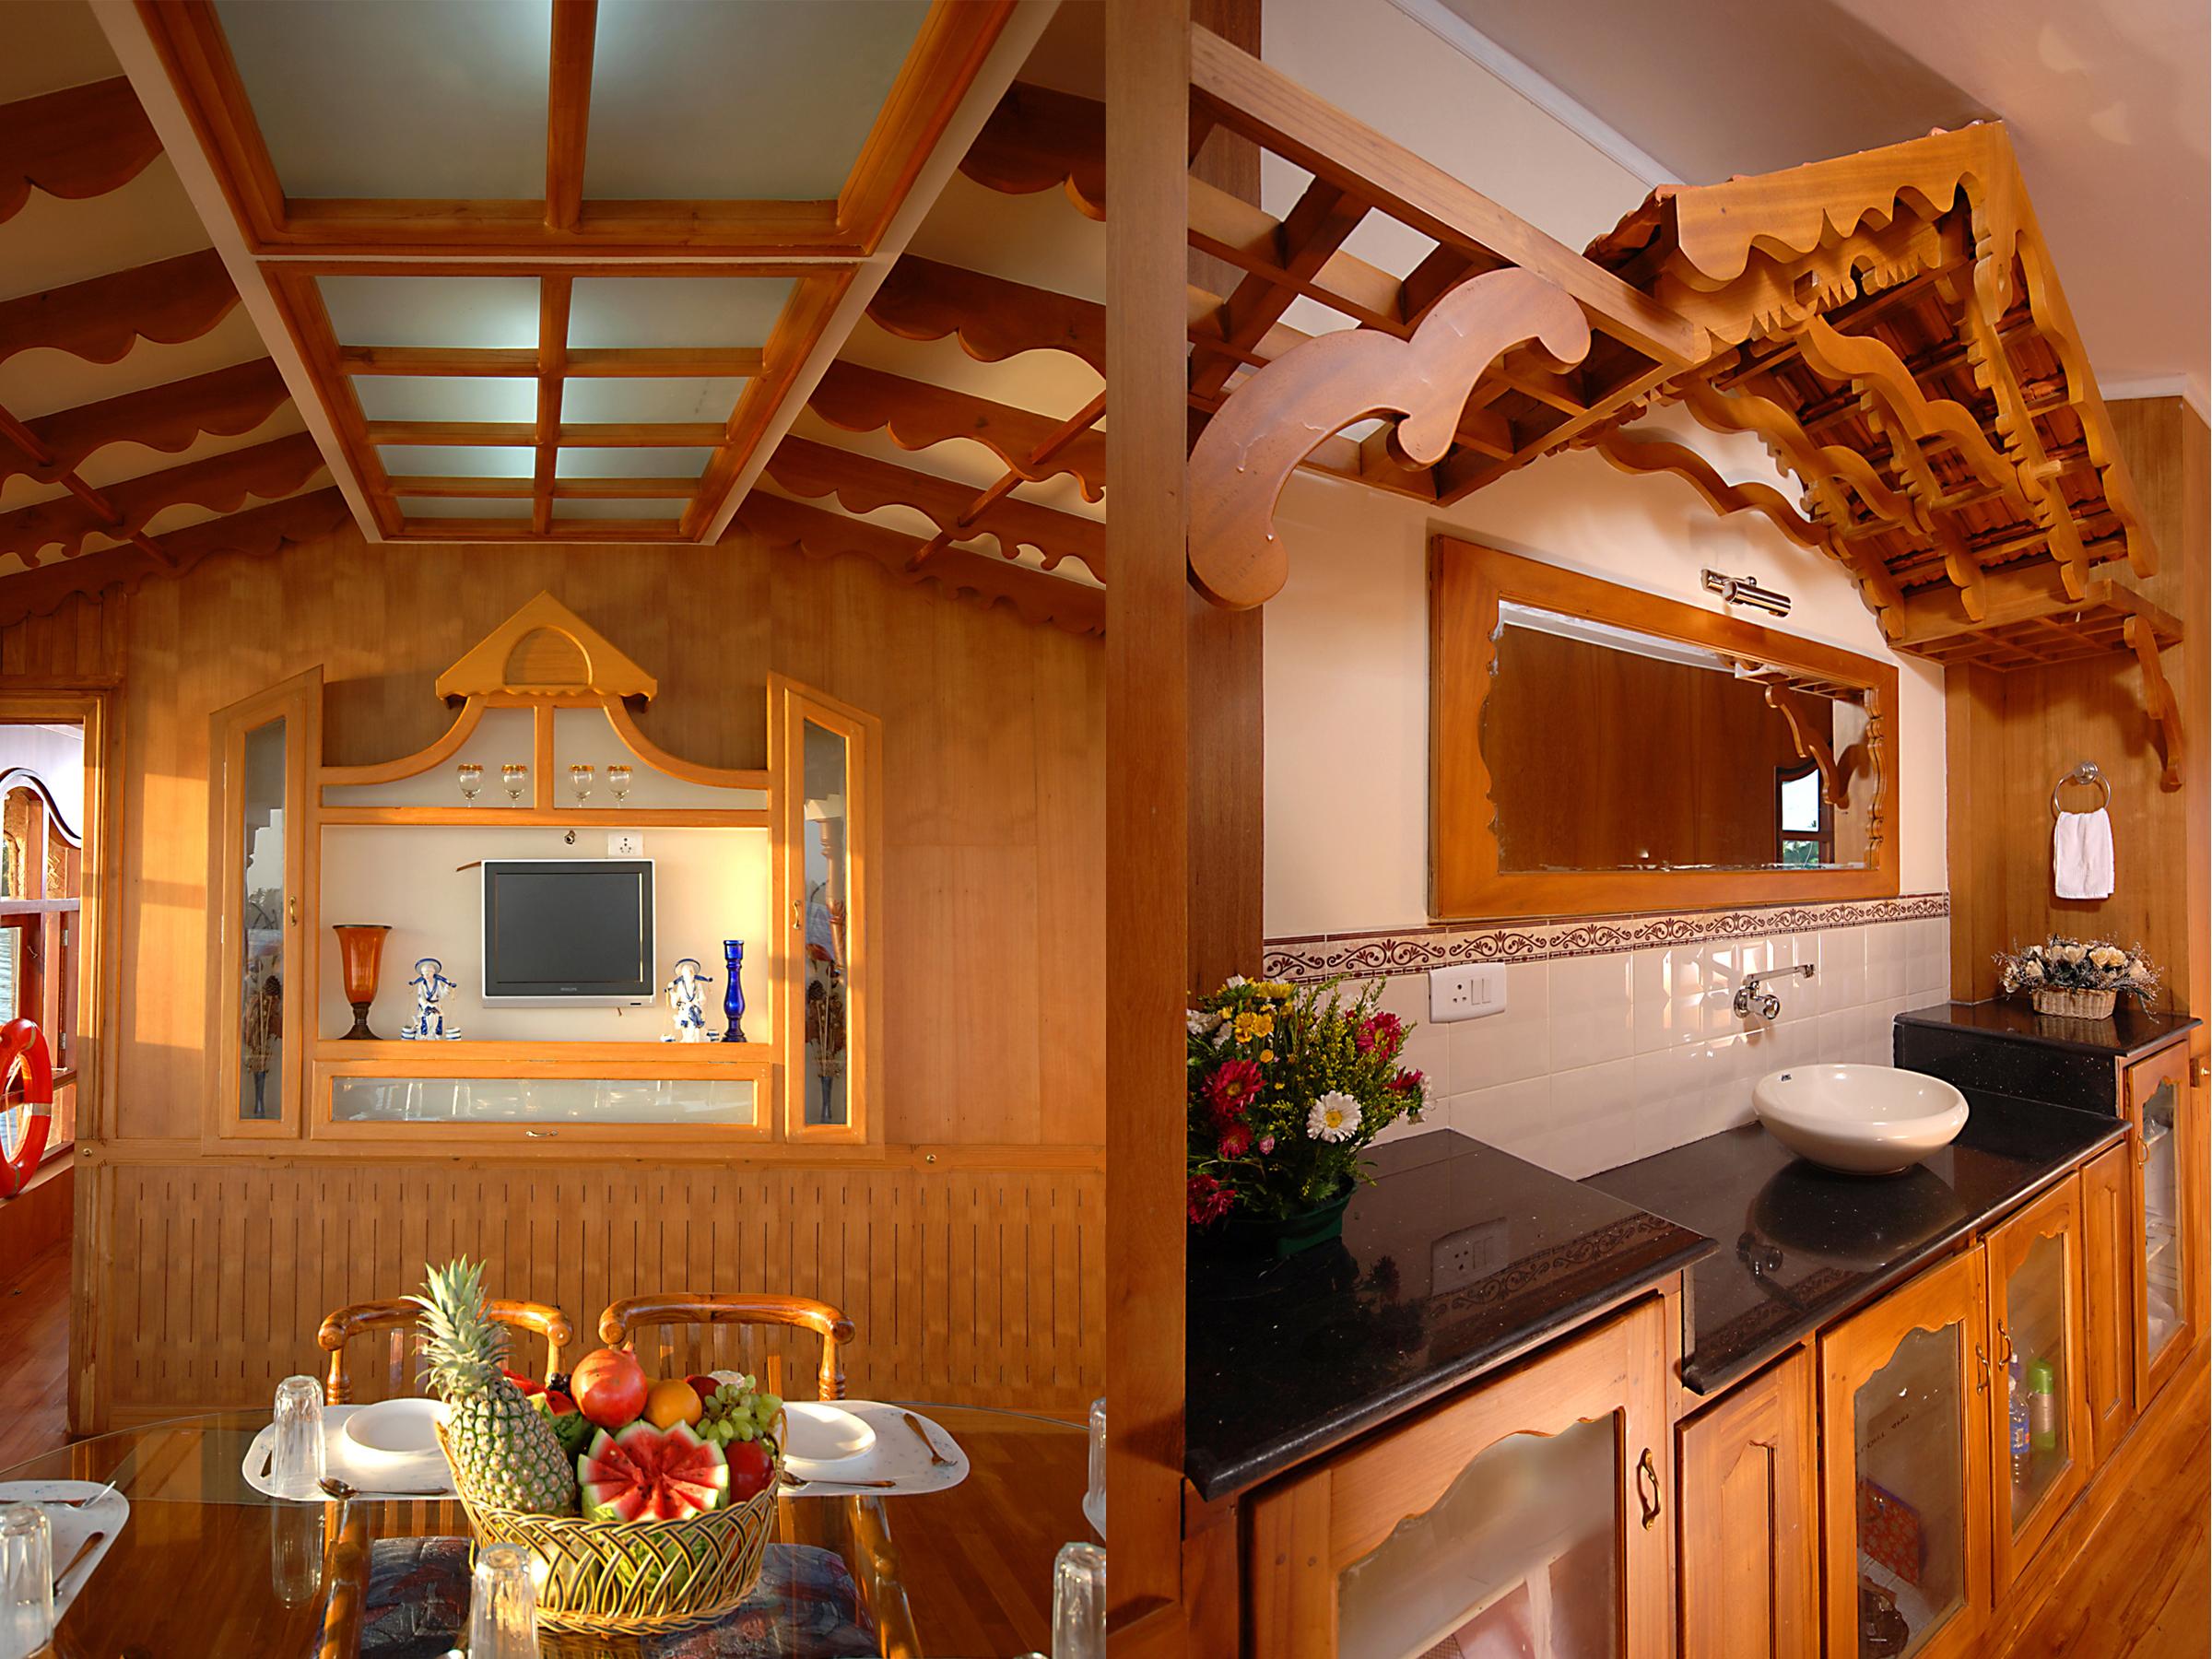 Kerala Premium Houseboats